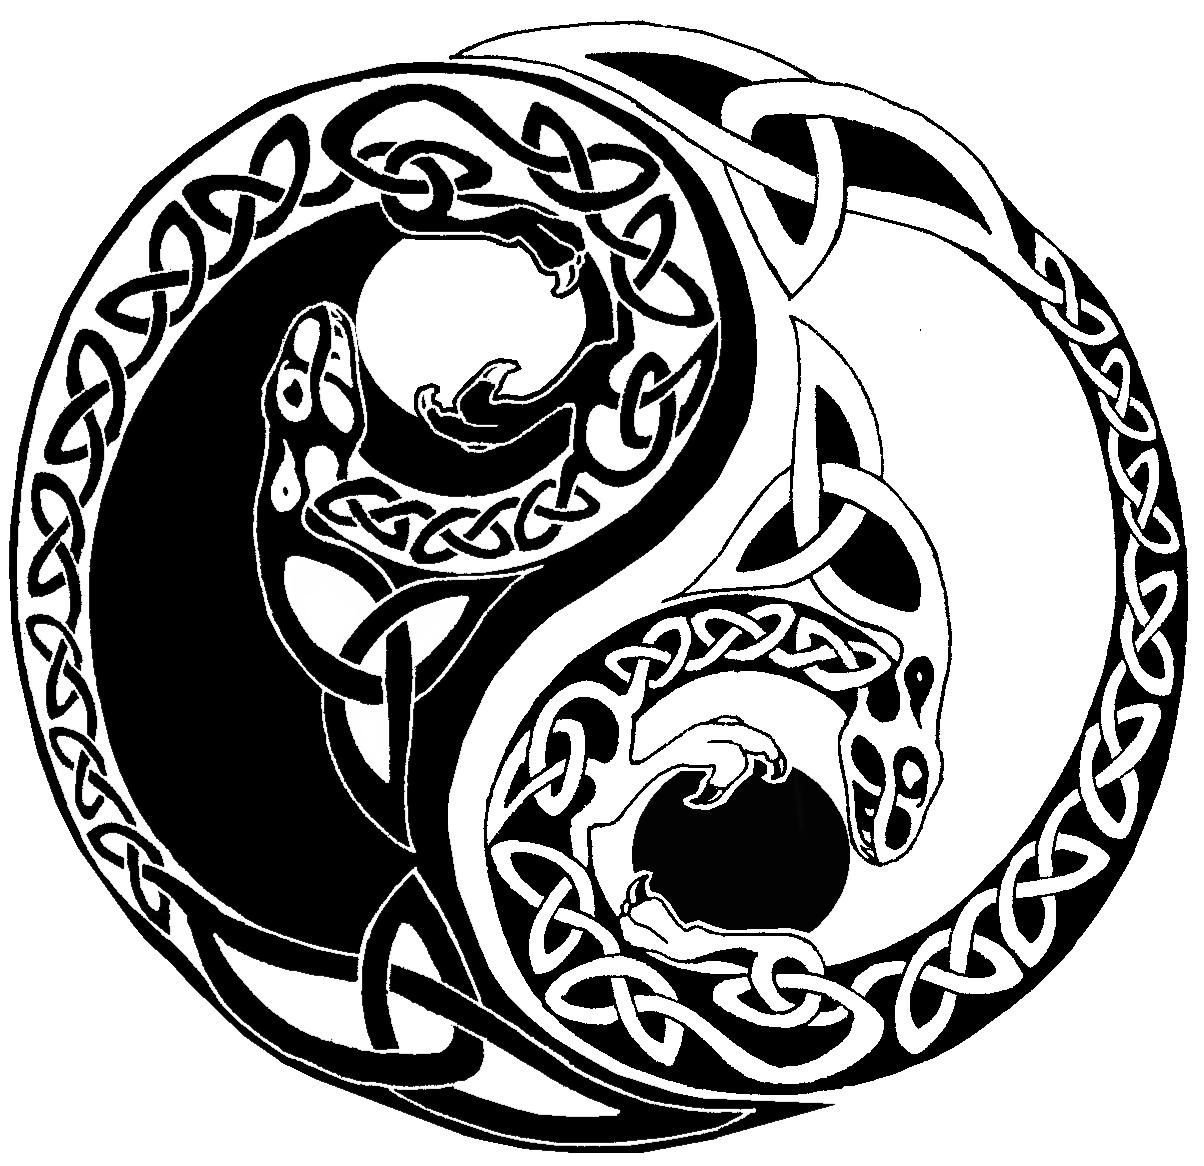 Celtic knot yin yang httpfc02iantartfs71f20101986 celtic knot yin yang httpfc02iantartfs71 buycottarizona Image collections